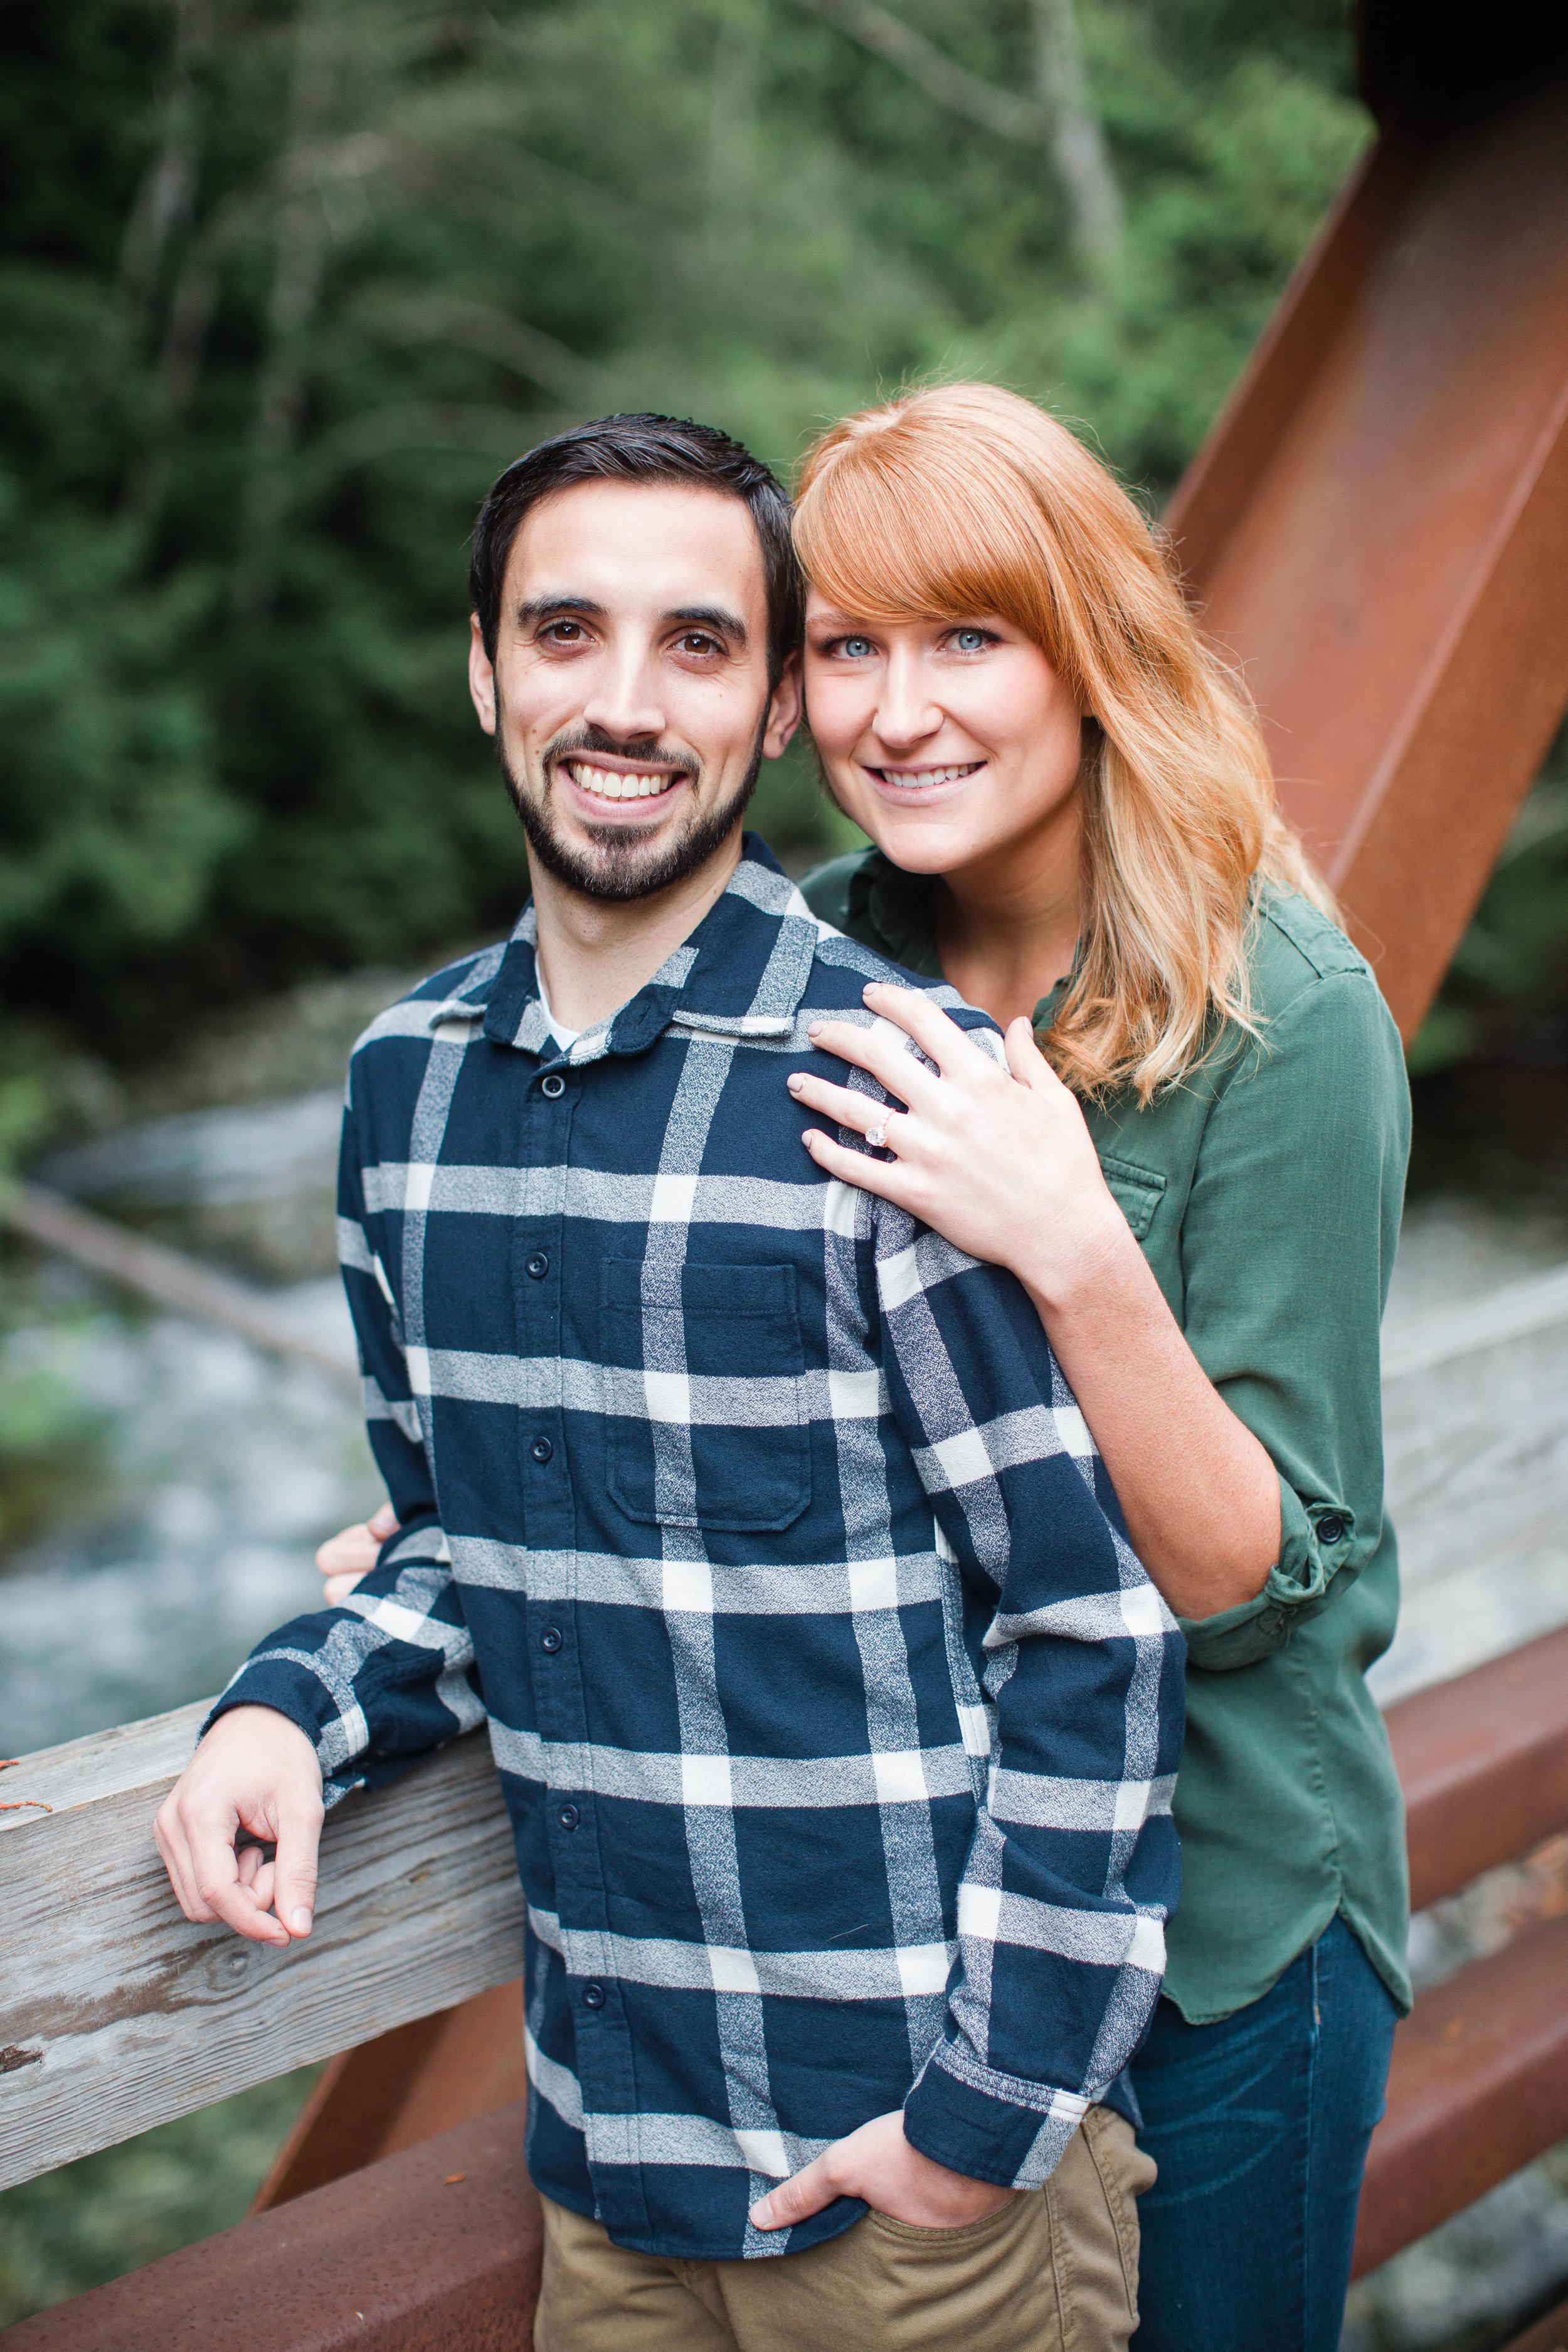 Ryan+Nicole_Franklin+Falls+Engagement_APW2016_9.JPG